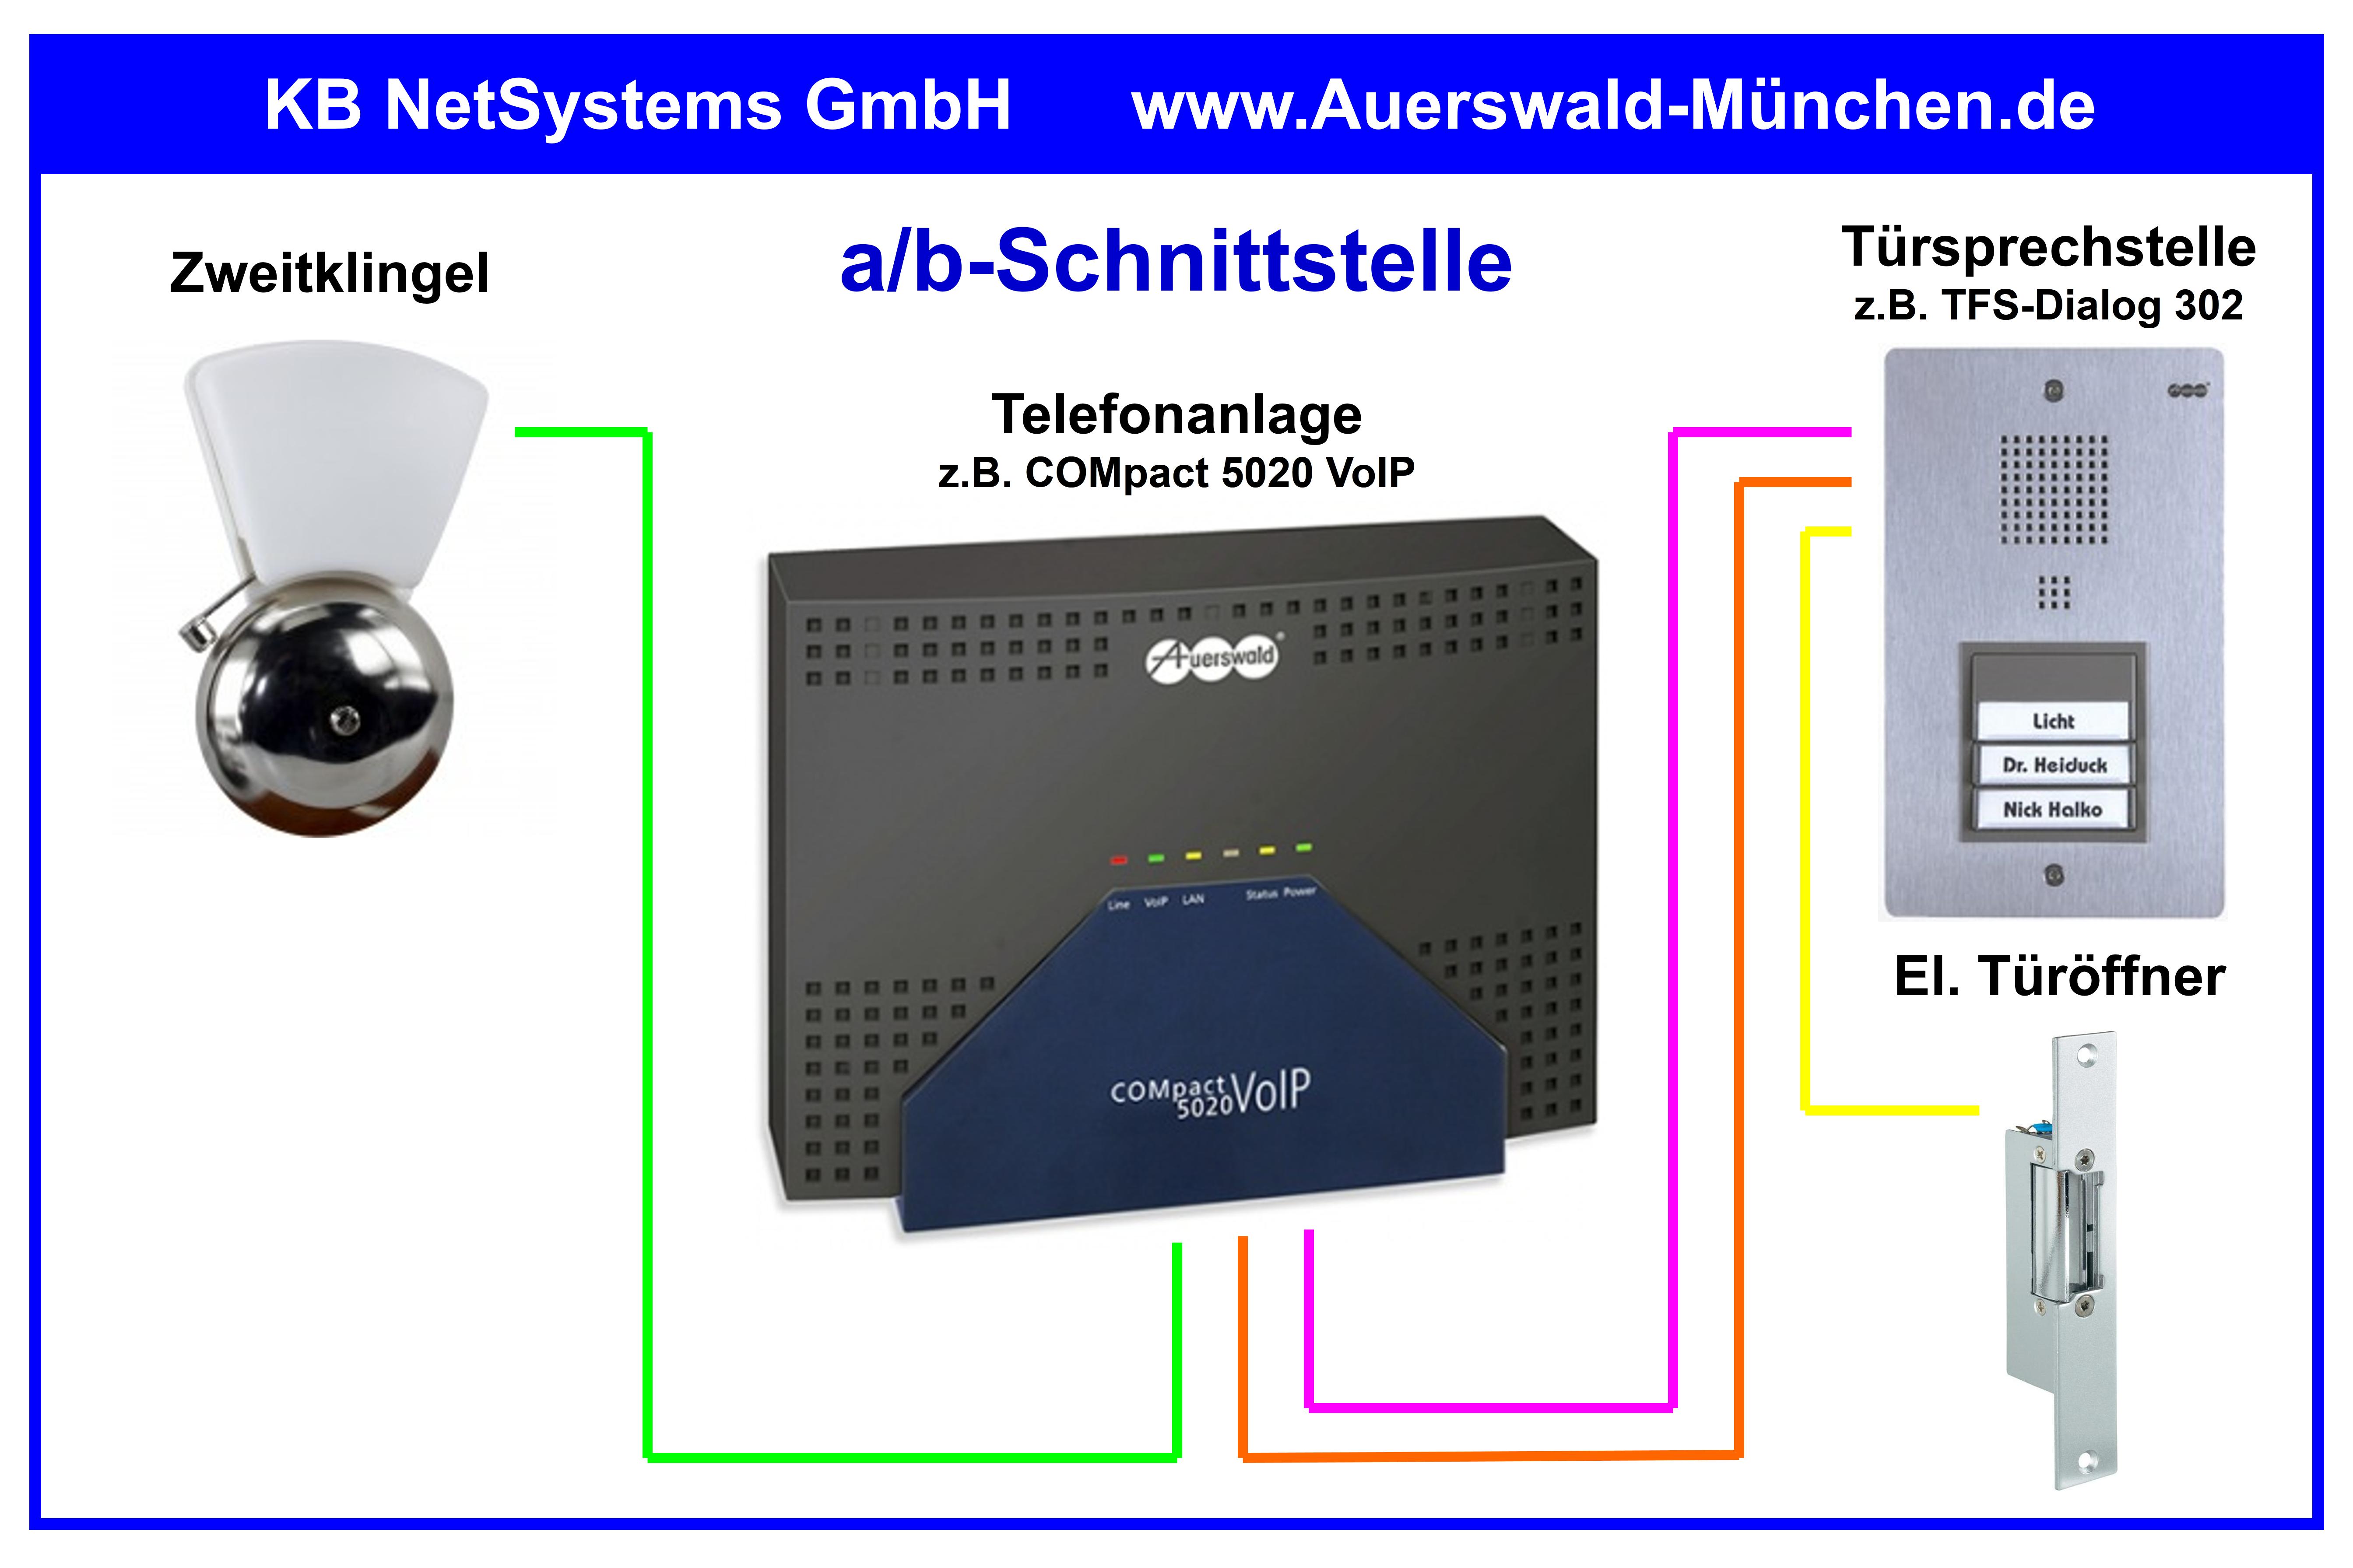 Türsprechtechnik - Auerswald Center München | KB NetSystems GmbH ...